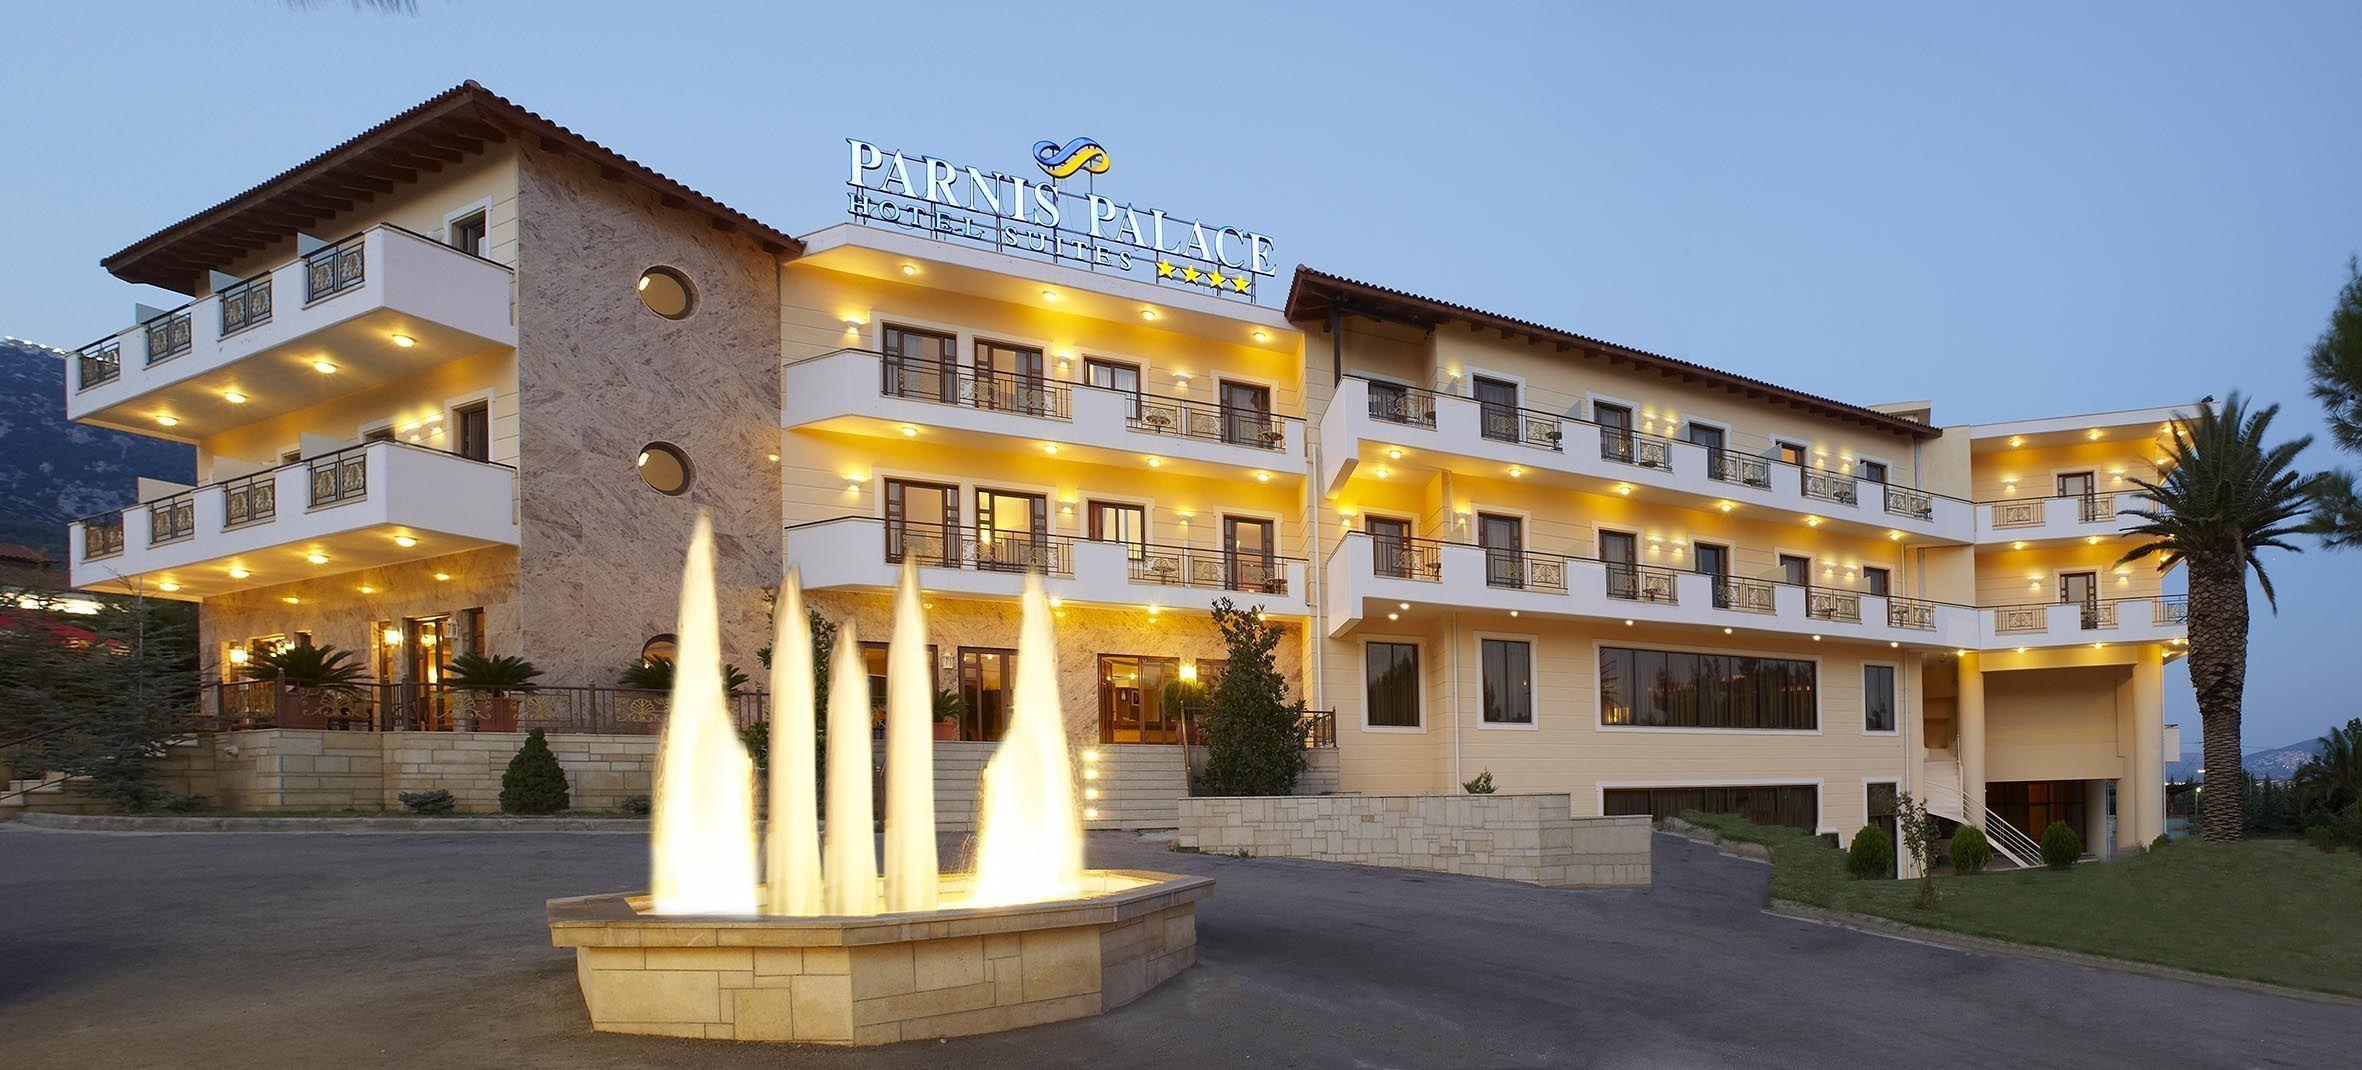 Parnis Palace Hotel Suites